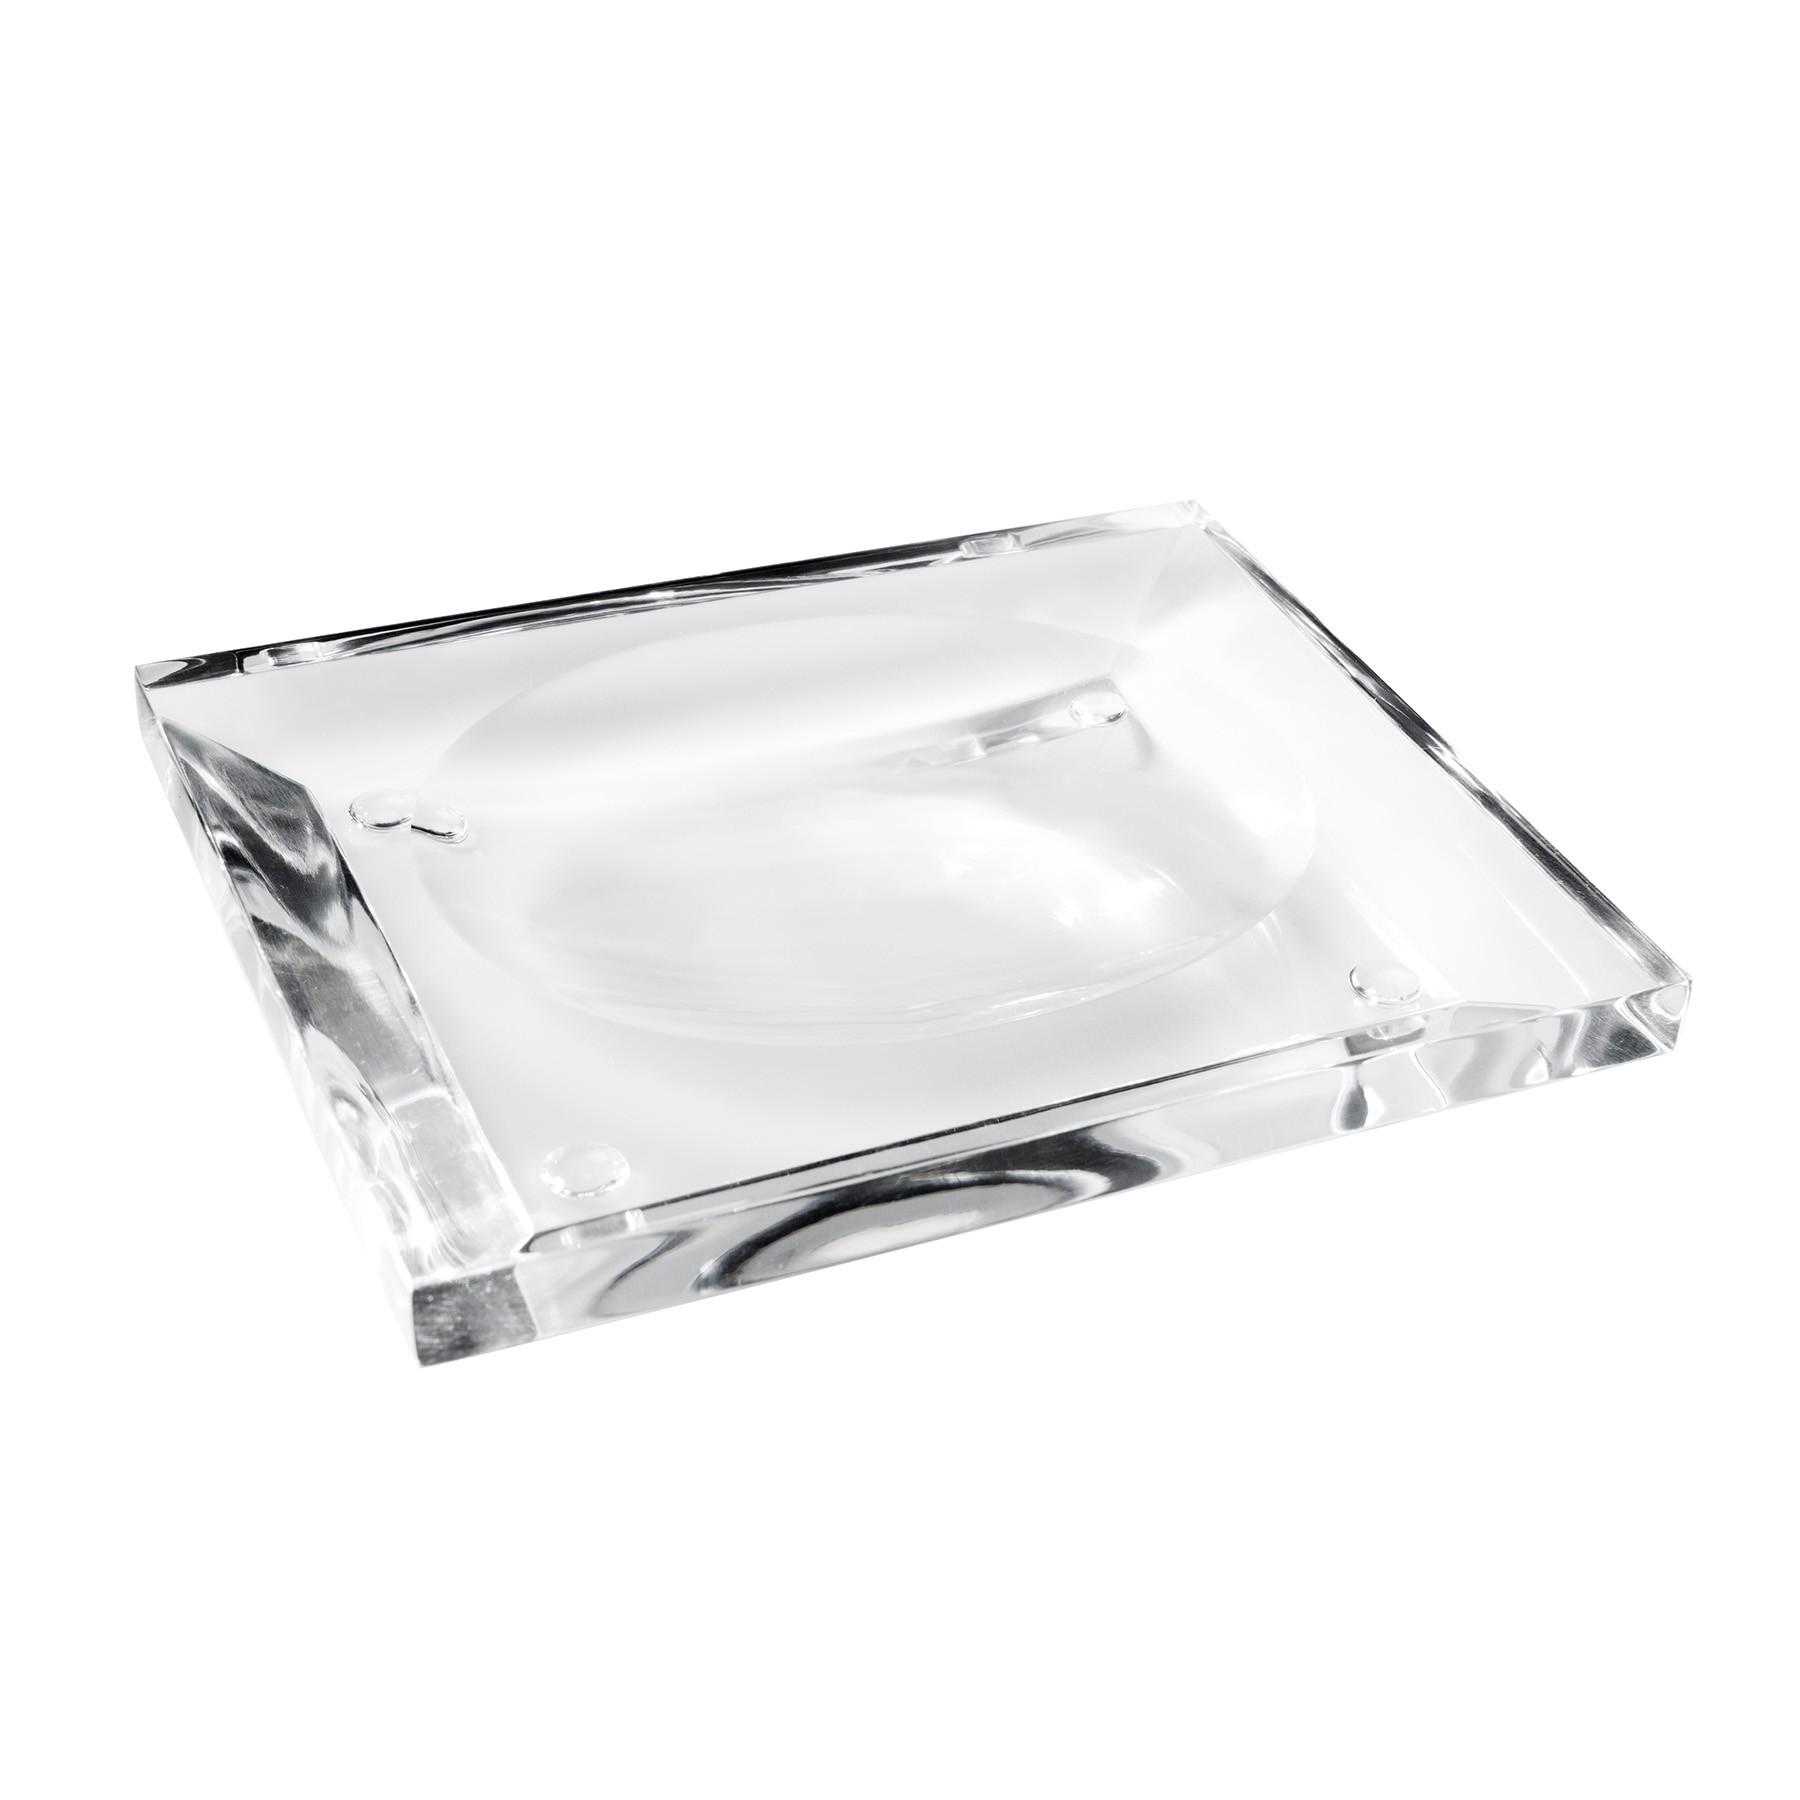 Saboneteira de mesa Onix - Cristal